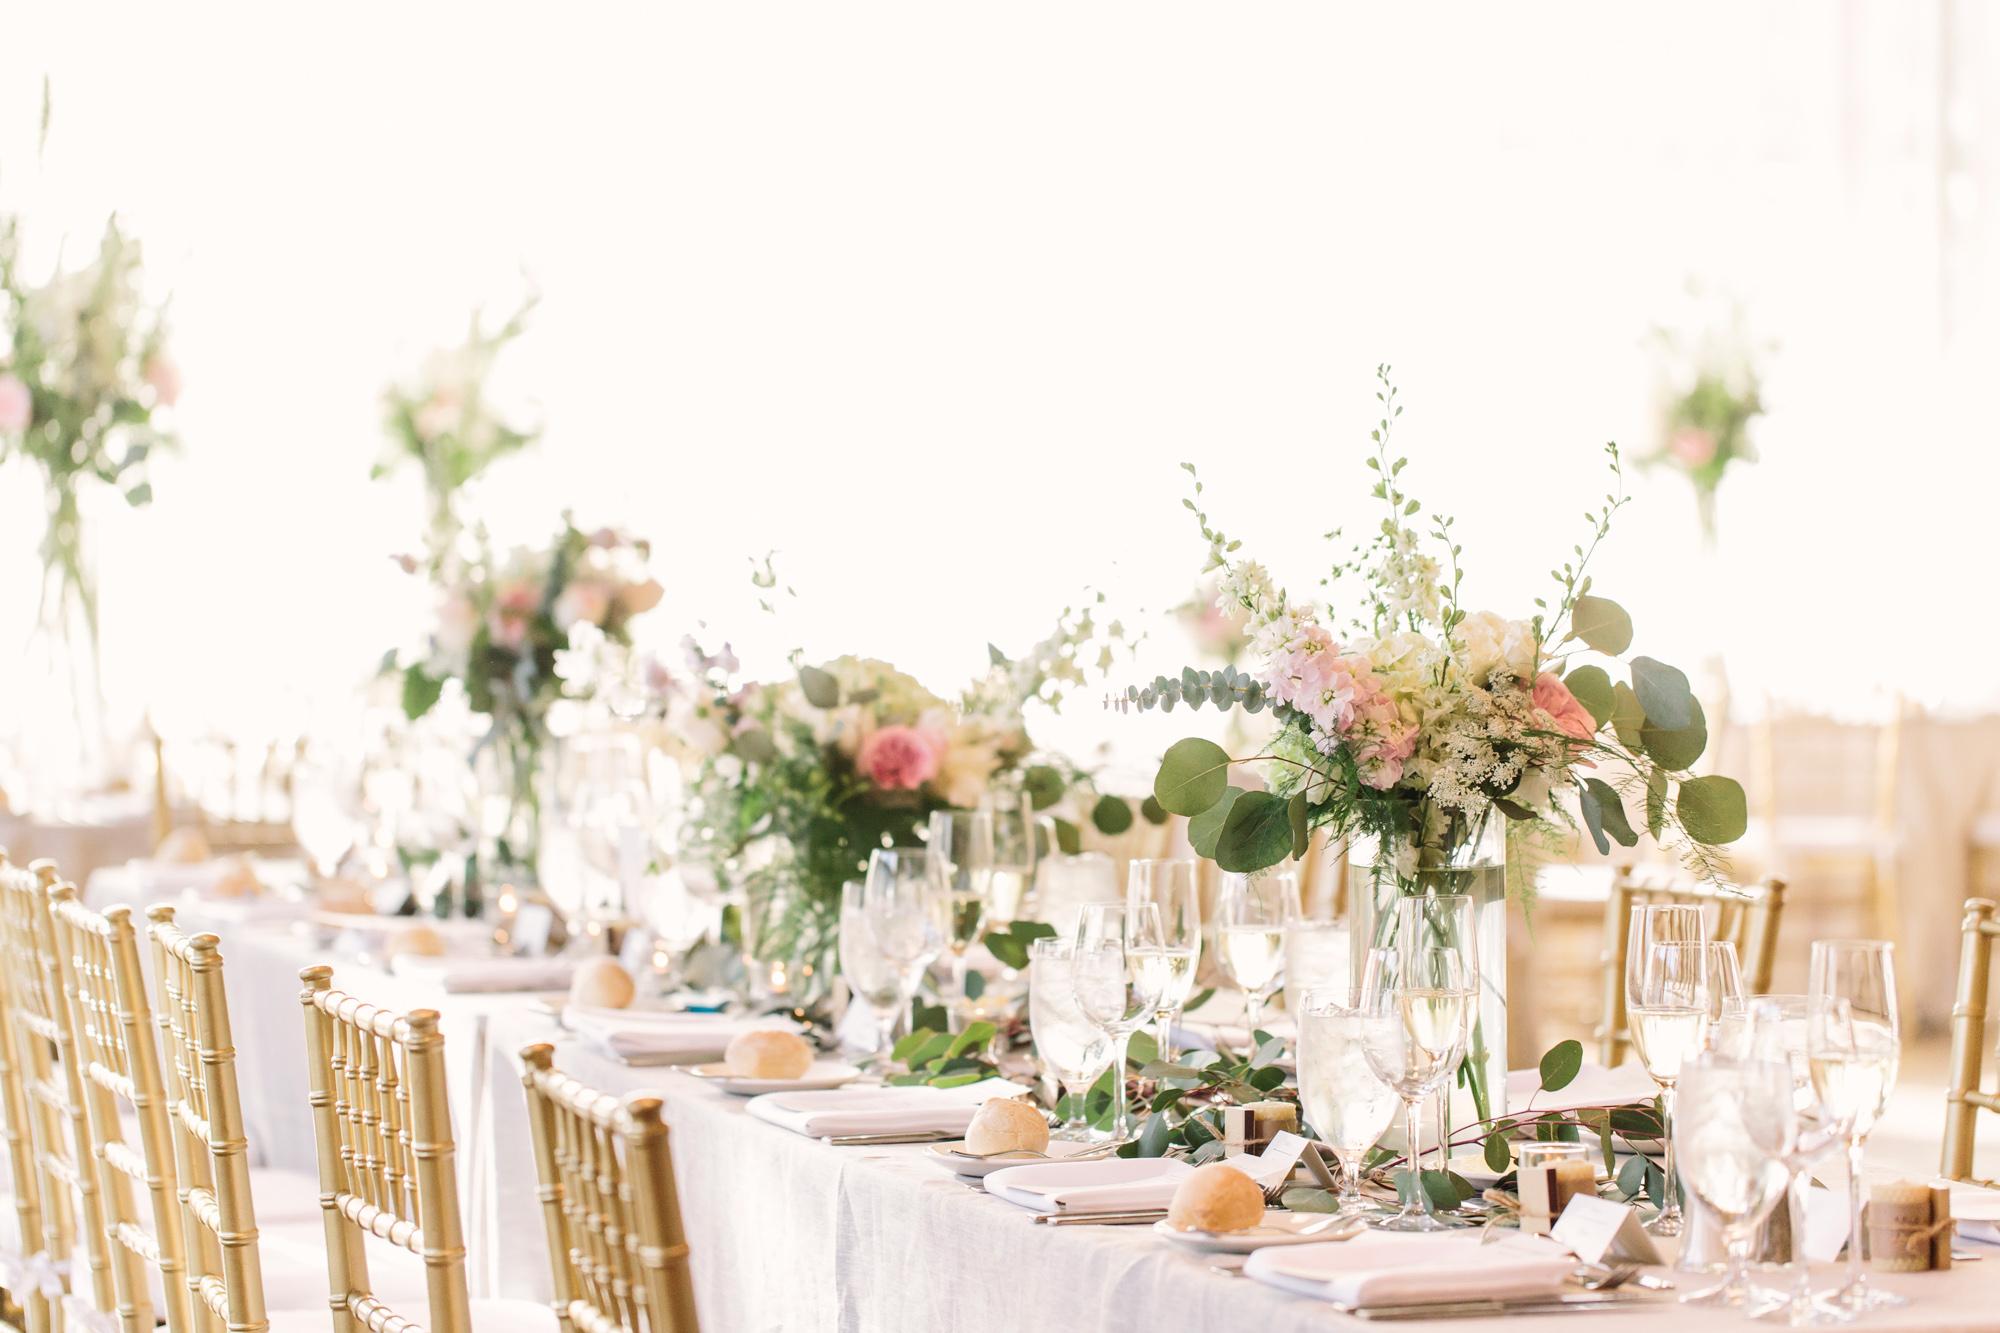 57_Rowan_Brian_The_Roundhouse_Wedding_Beacon_NY_Tanya_Salazar_Photography_1180.jpg